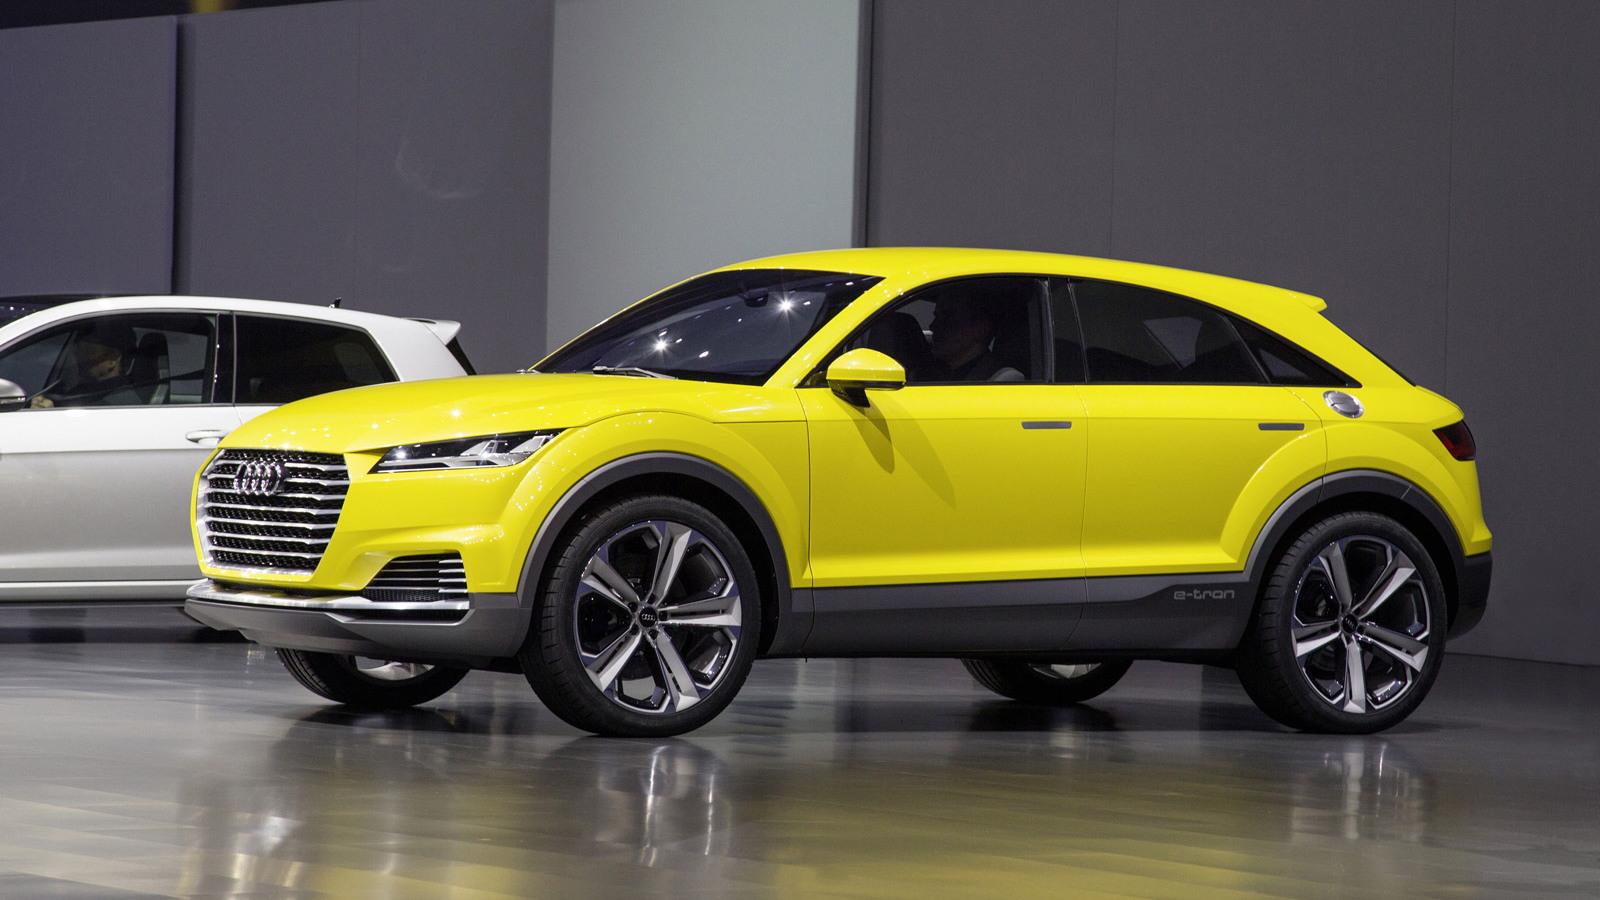 Audi TT Offroad concept, 2014 Beijing Auto Show